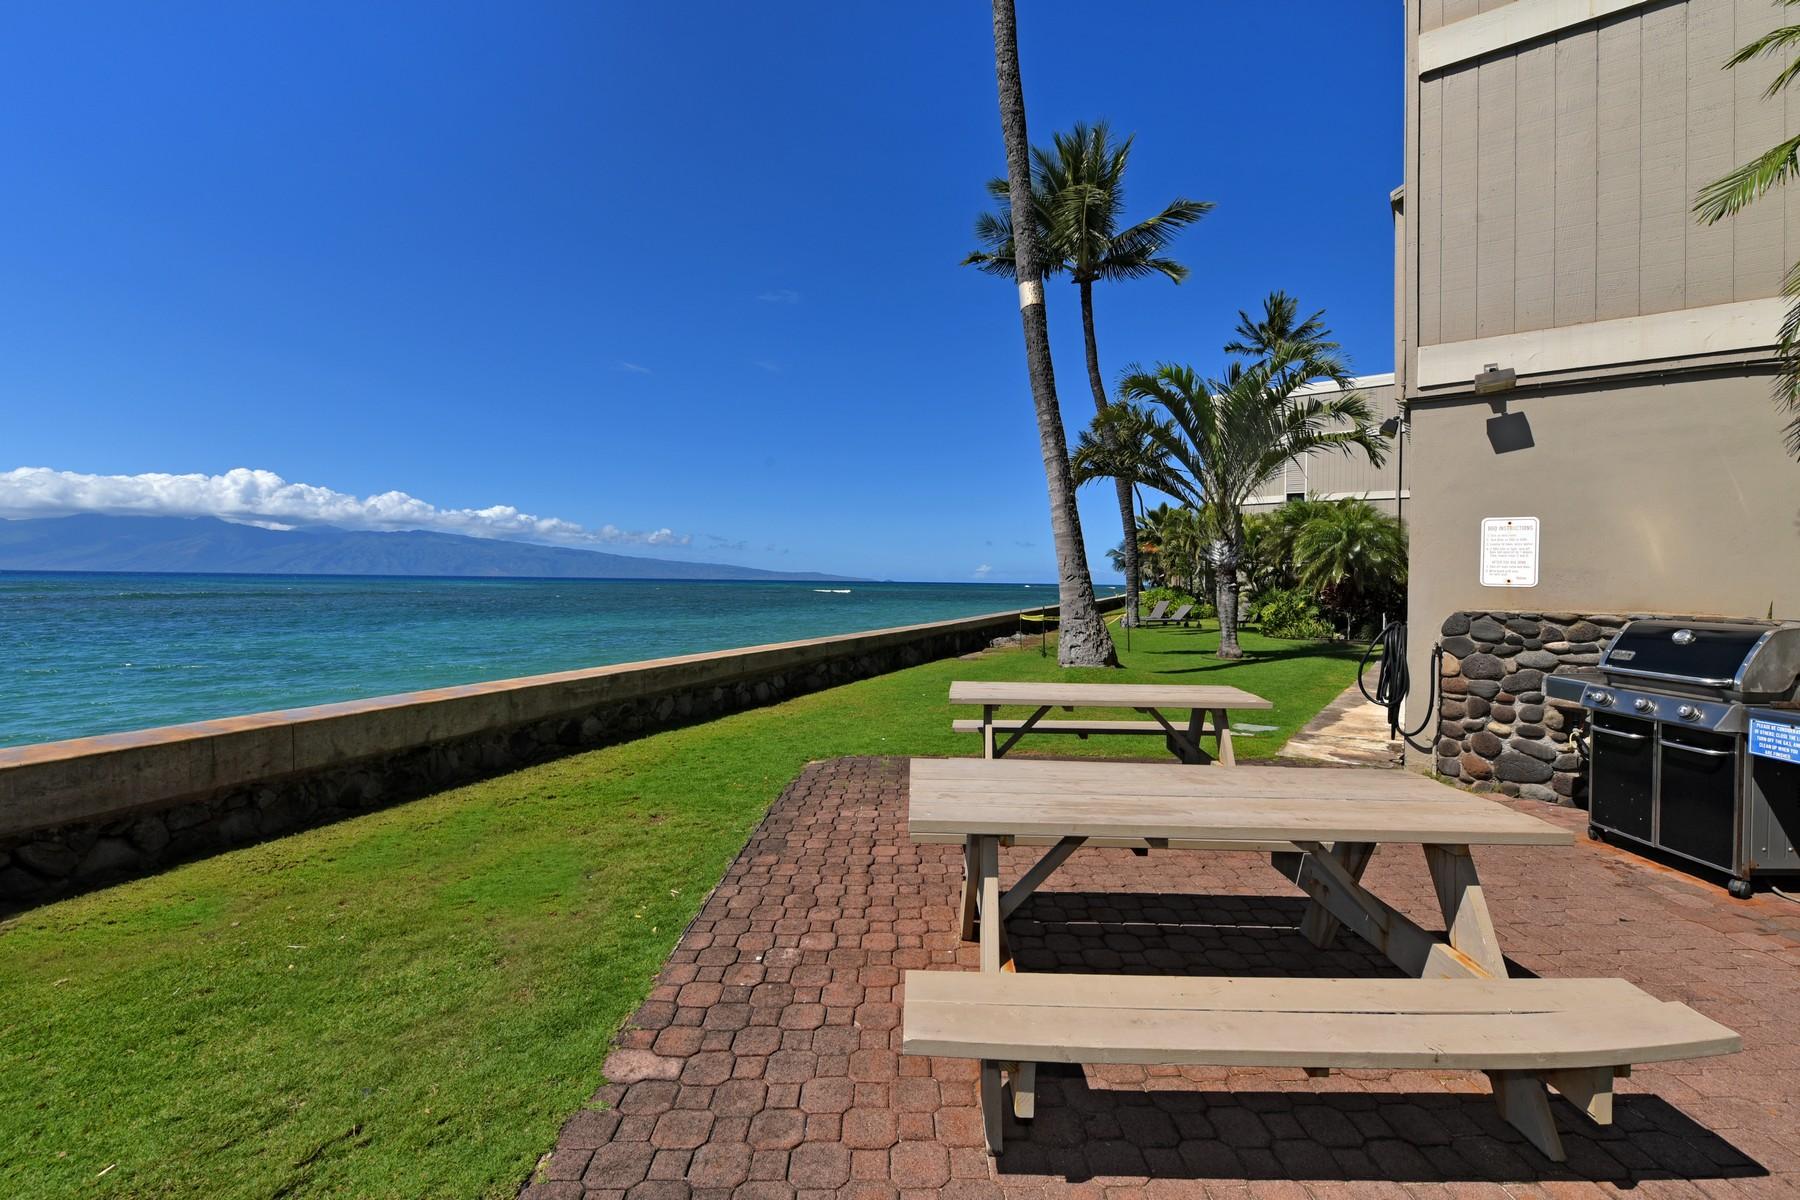 Condominiums for Sale at Vacation Rental in Tropical Garden Setting 4435 Lower Honoapiilani Road, Pohailani Maui 131 Kahana, Hawaii 96761 United States